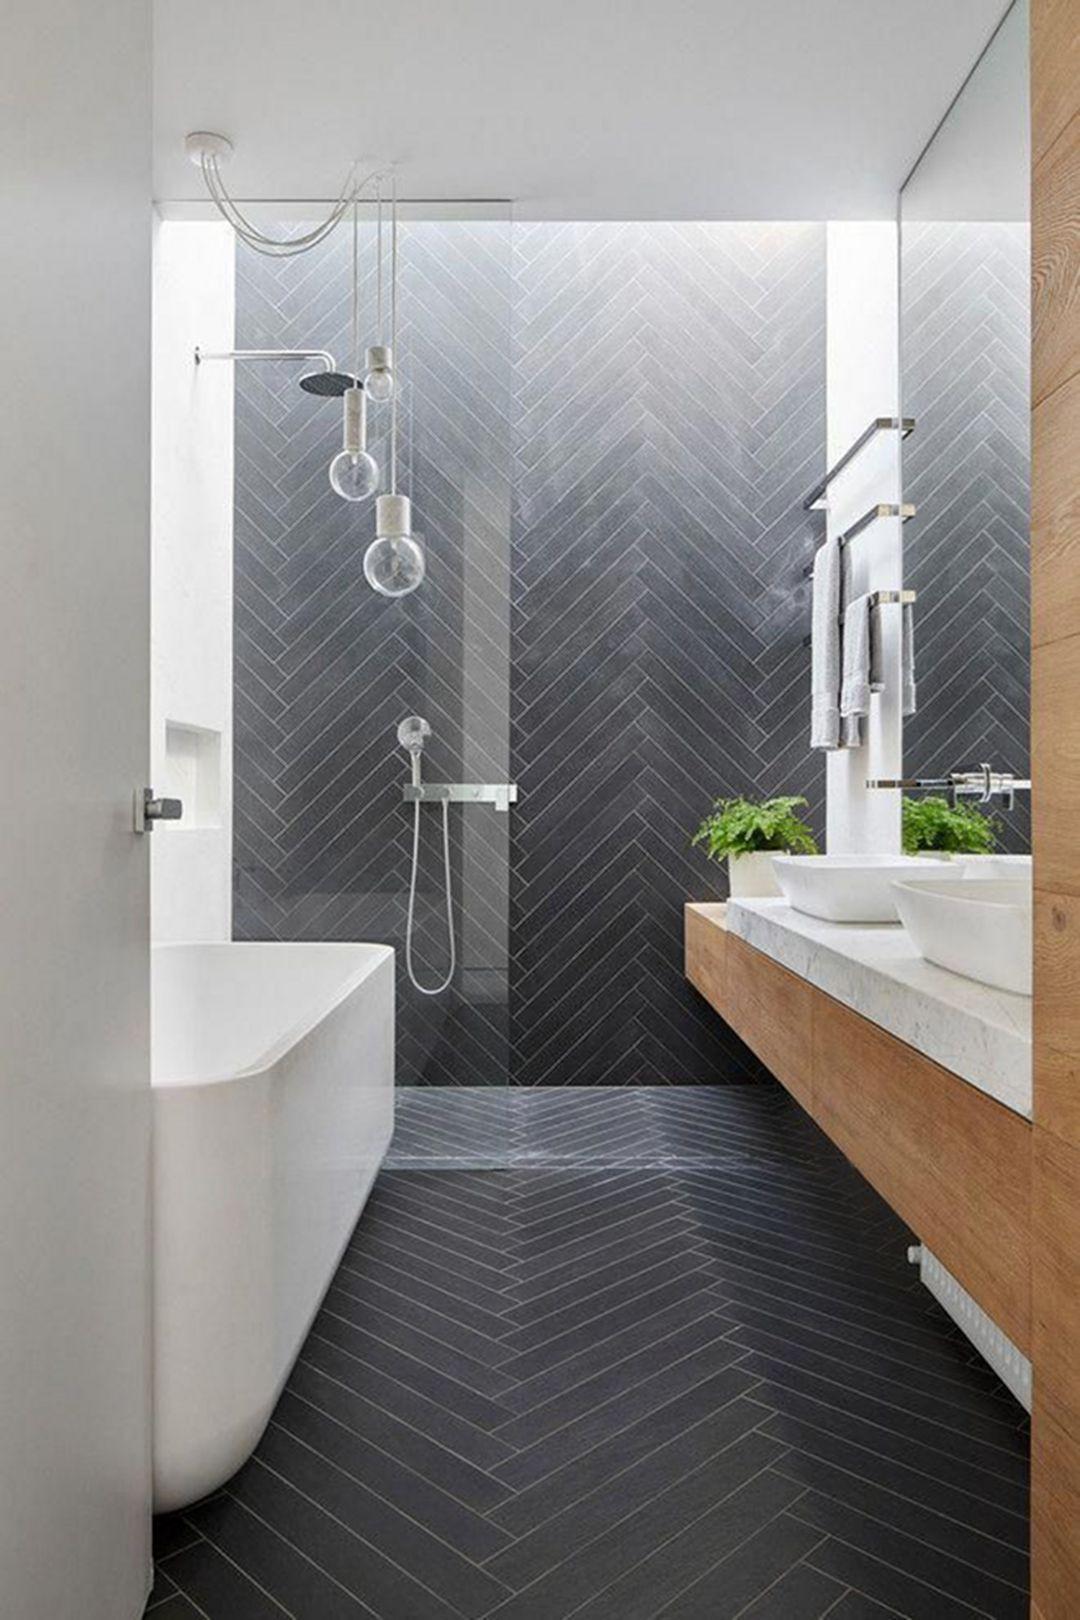 Amazing Small Bathroom Wall Tiles 243018 Goodsgn Small Bathroom Bathroom Remodel Master Bathroom Design